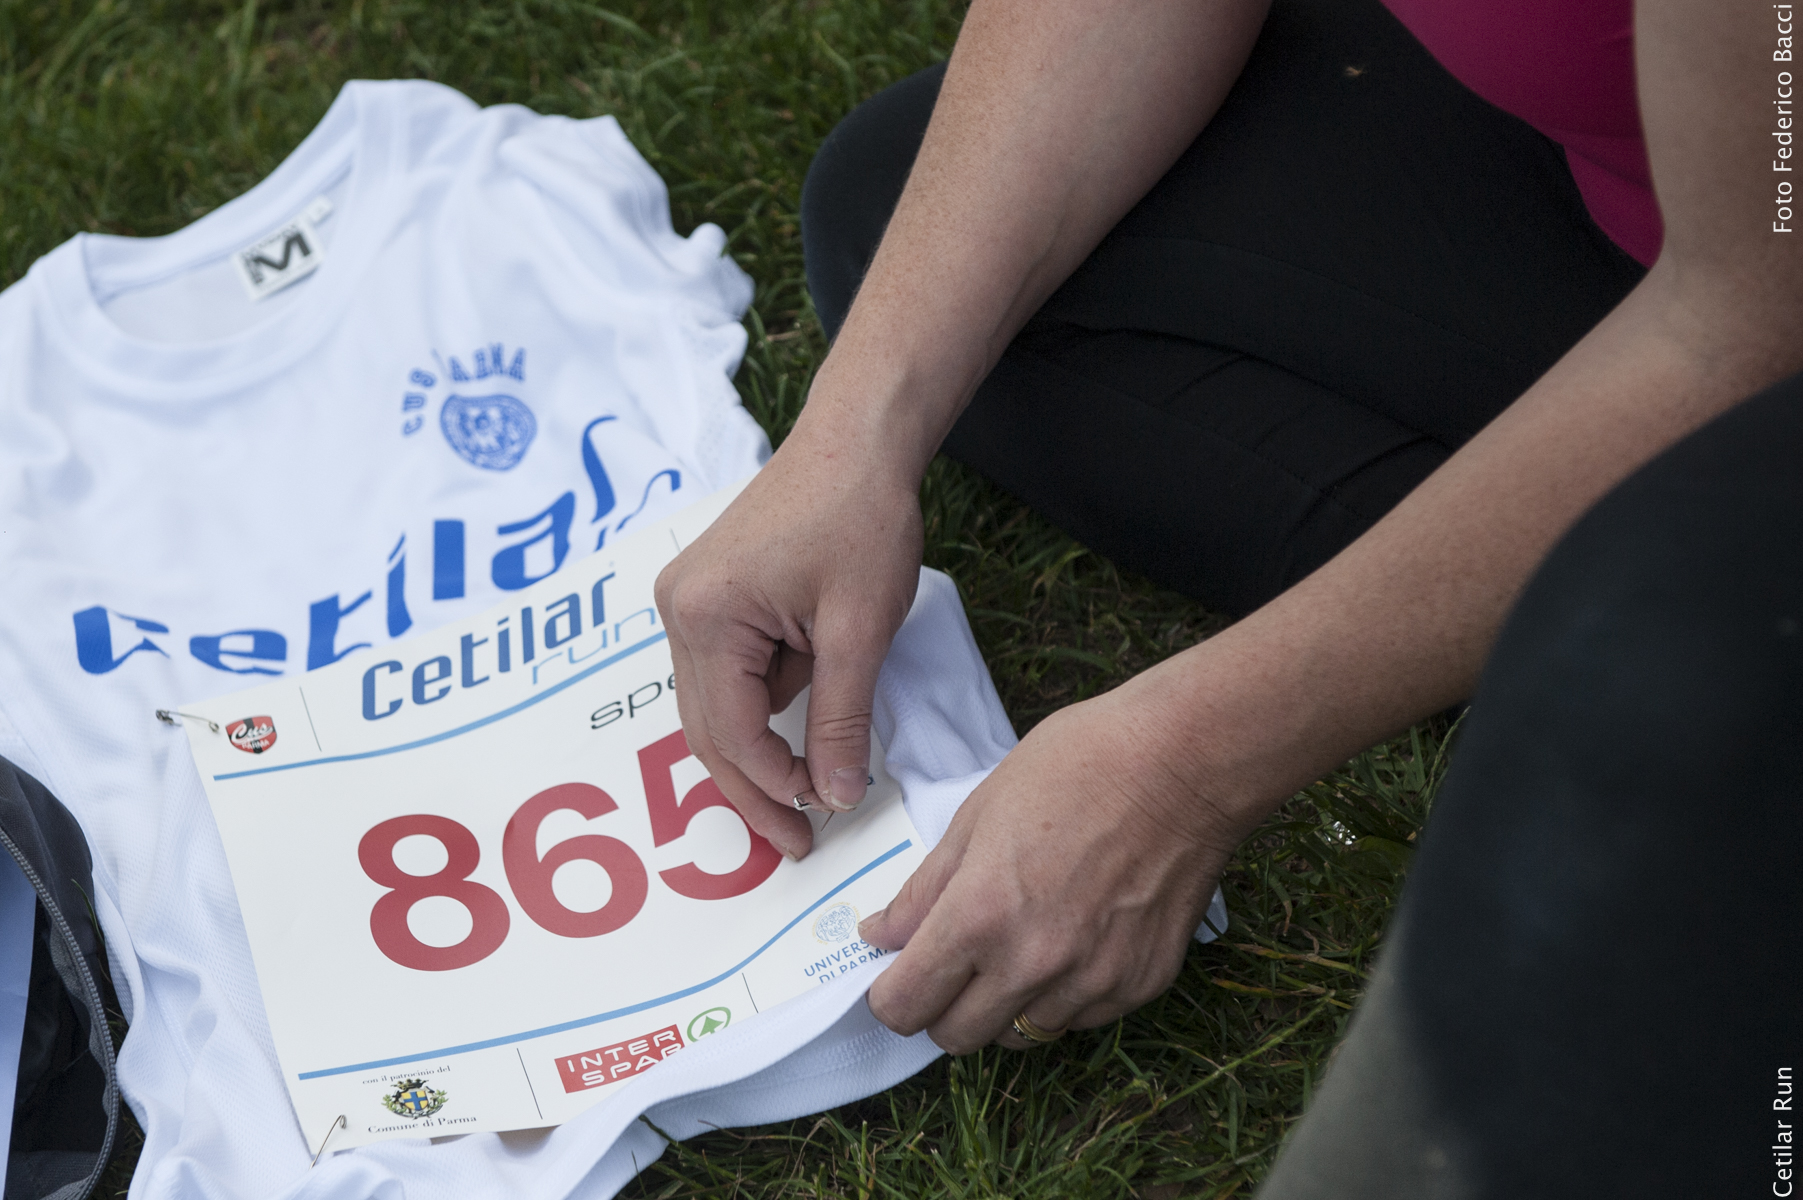 Cetilar Run Parma 2018